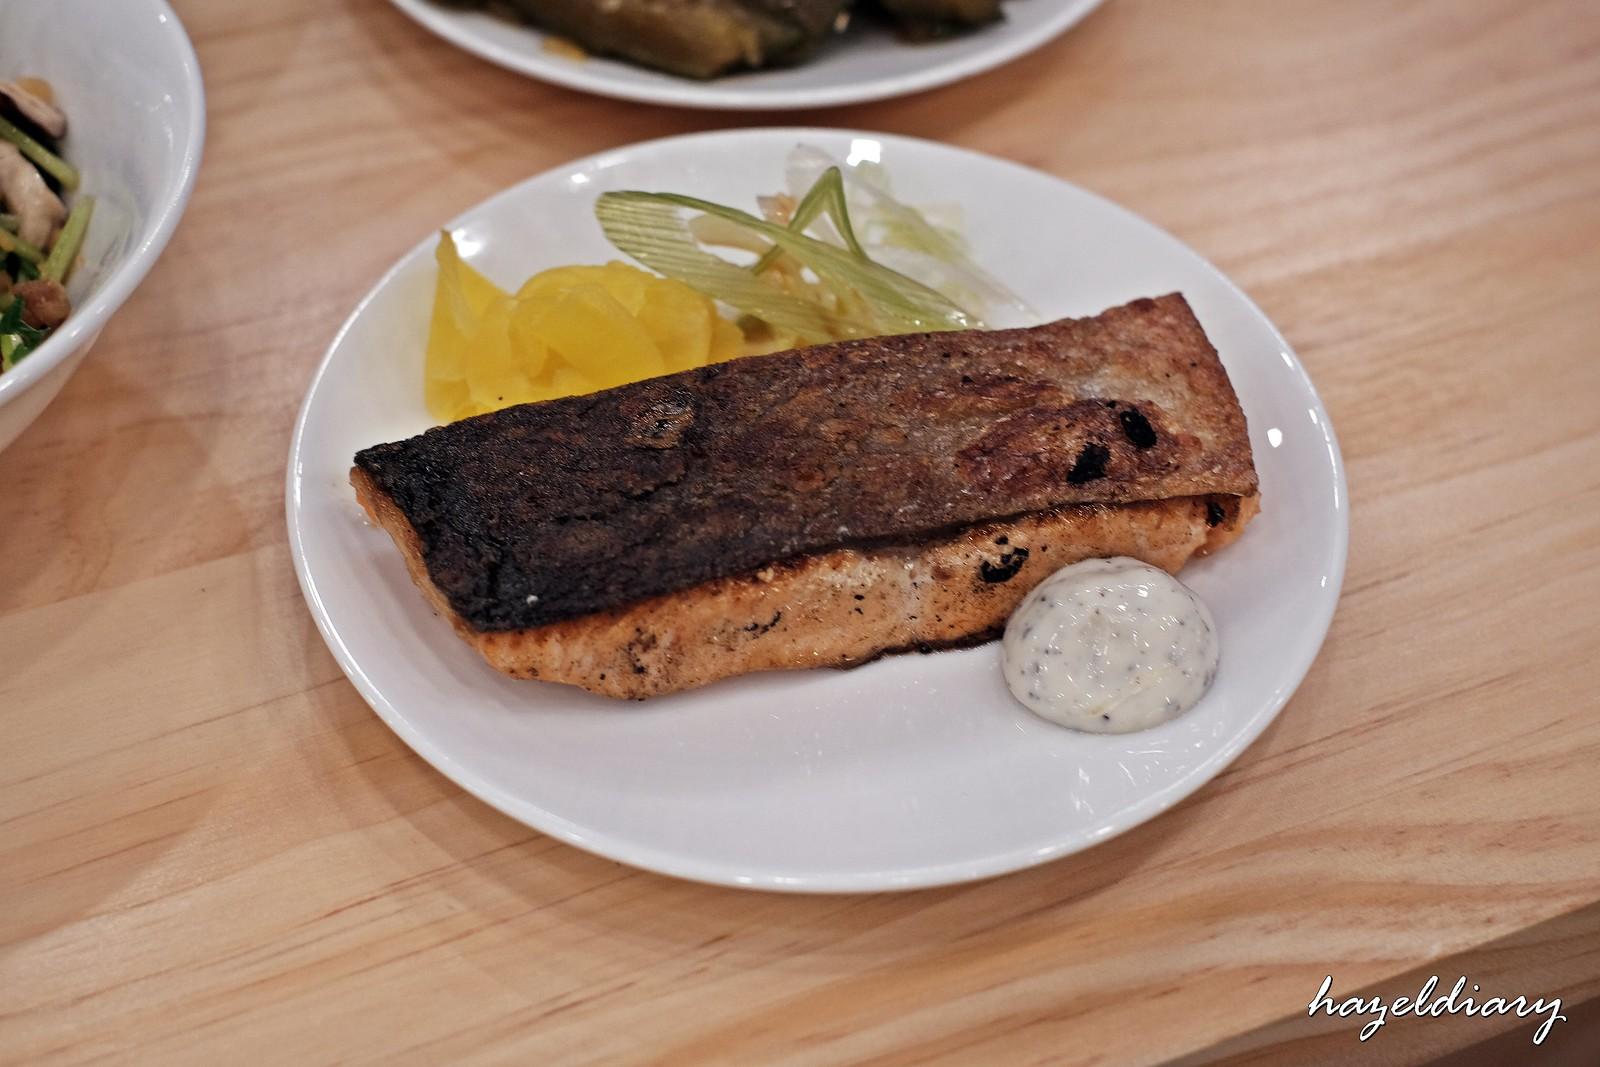 The Salted Plum-Salmon